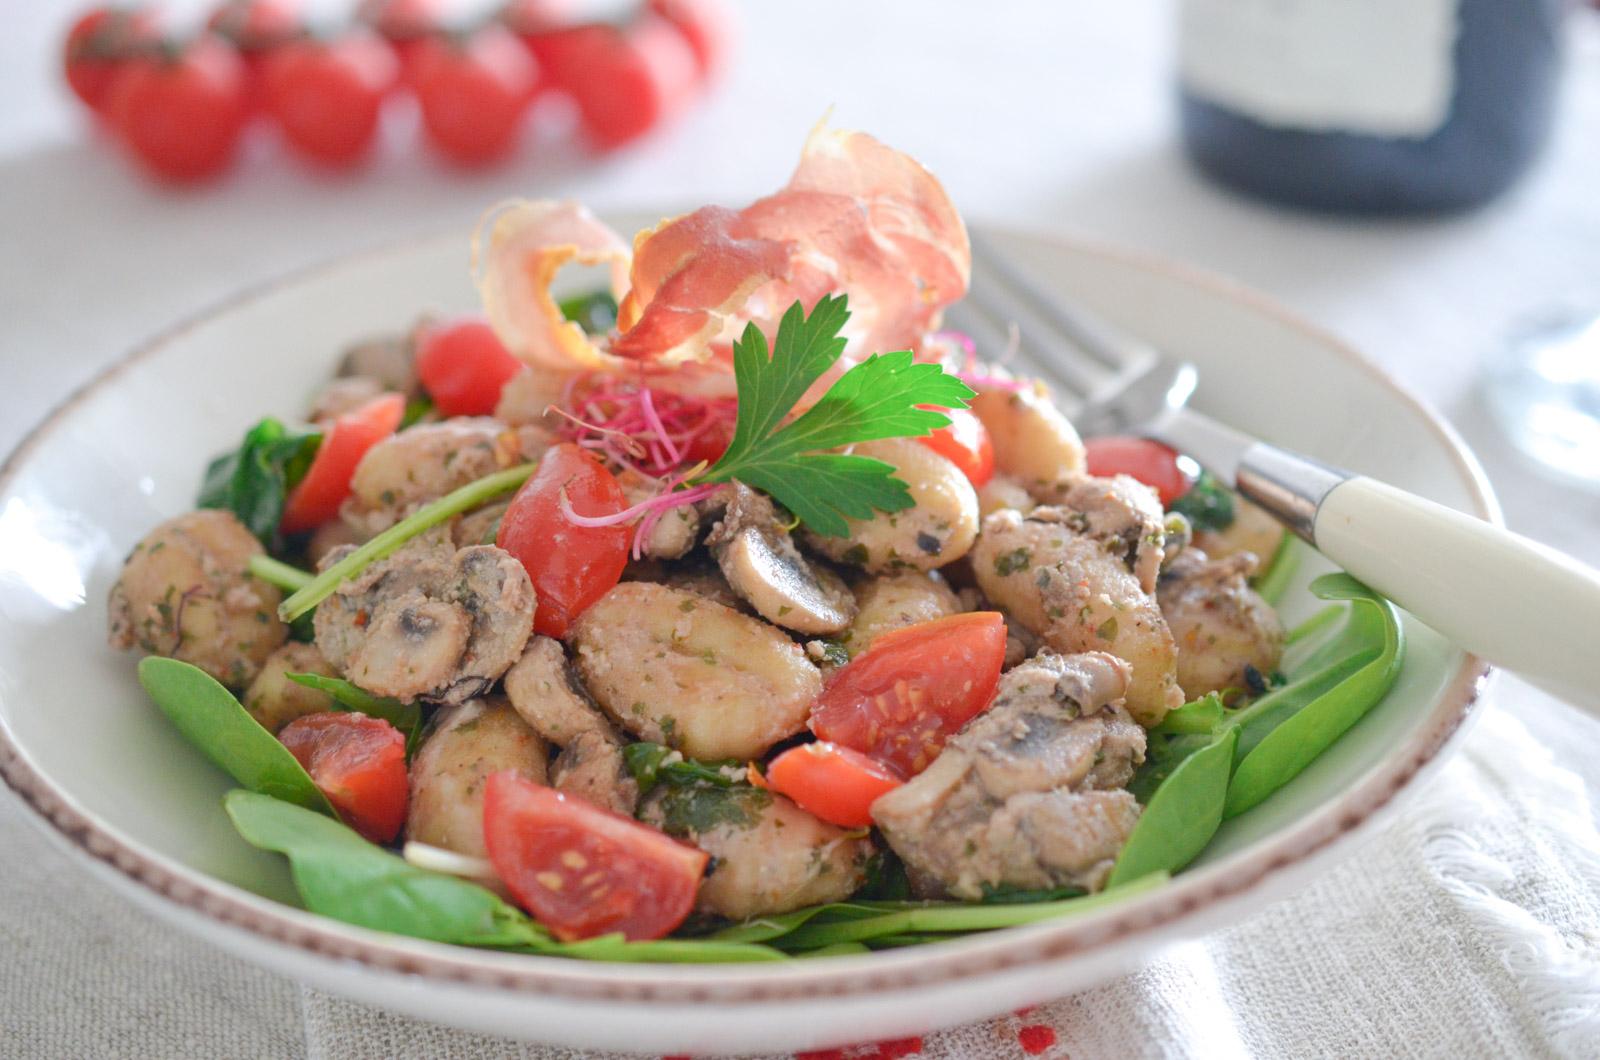 Gnocchis Champignons Pesto Noix Pancetta (5 Sur 6)